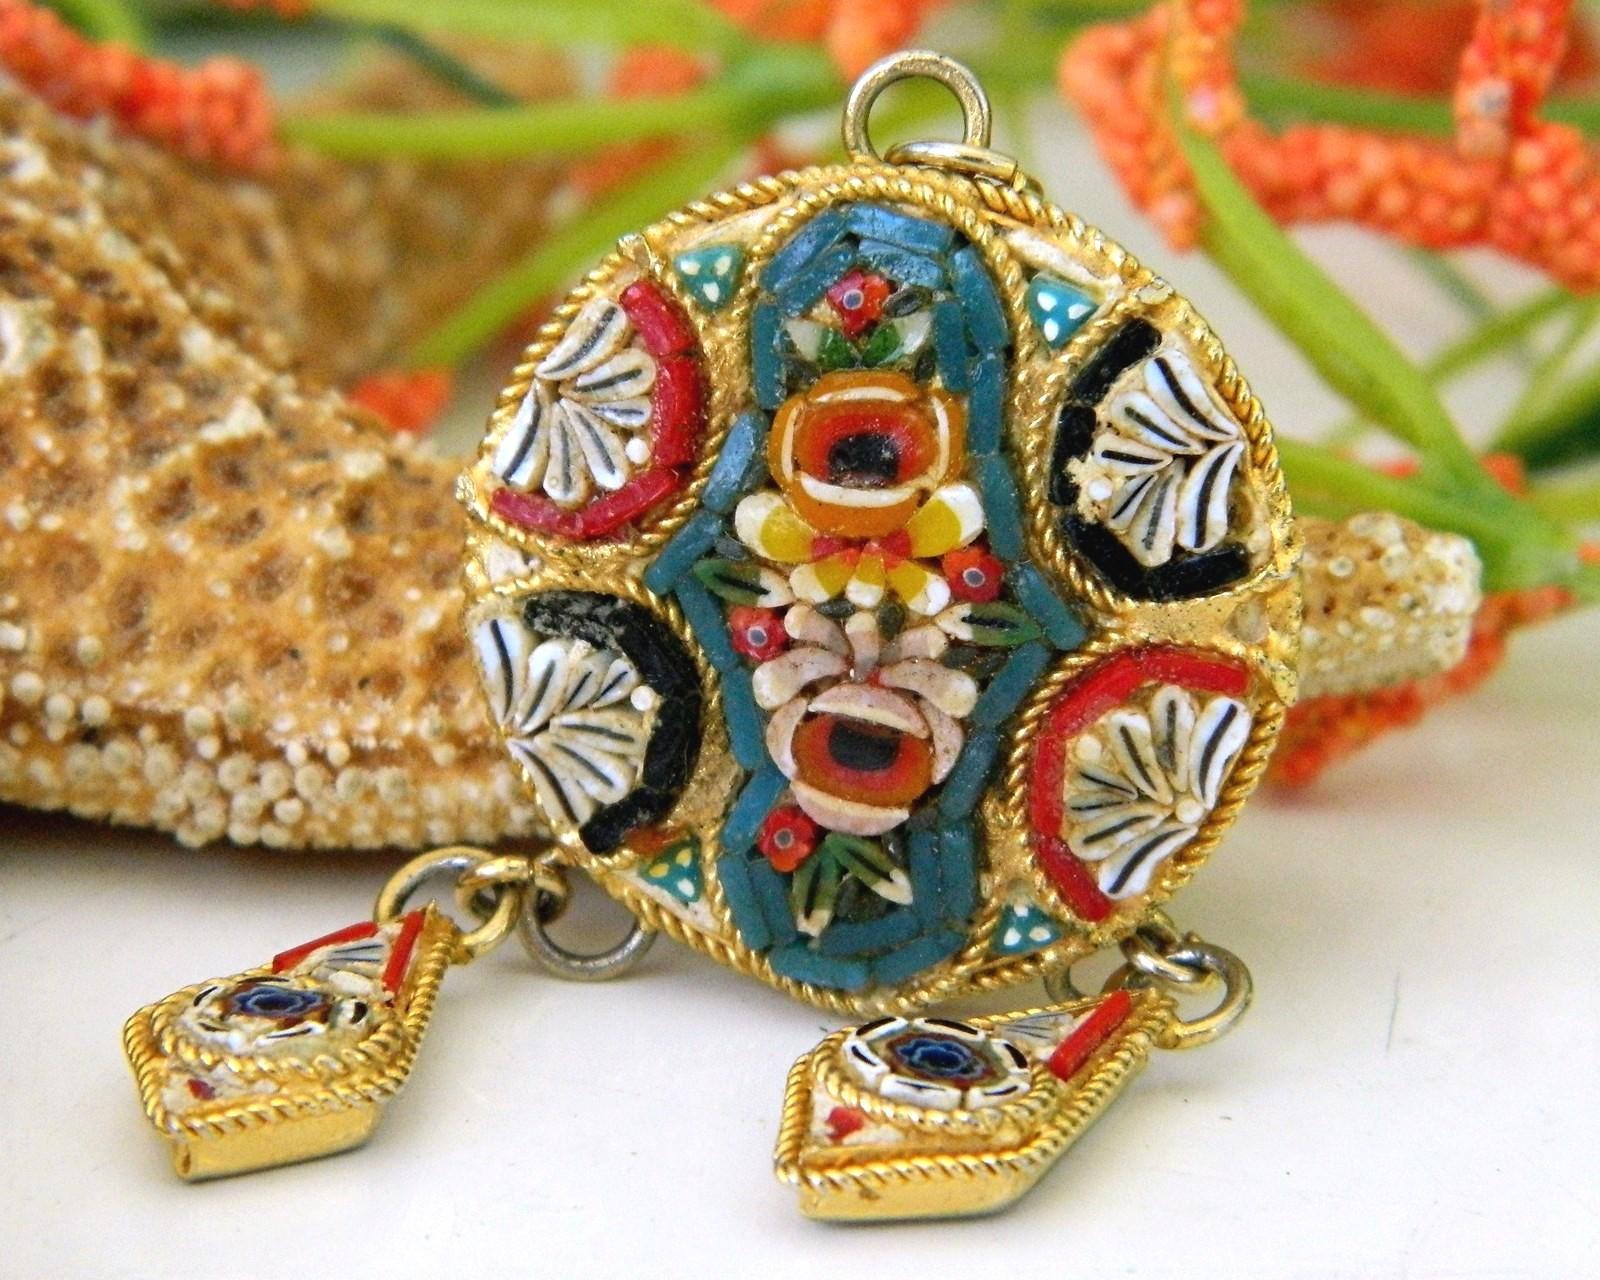 Vintage micro mosaic italy pendant dangles flowers tesserae